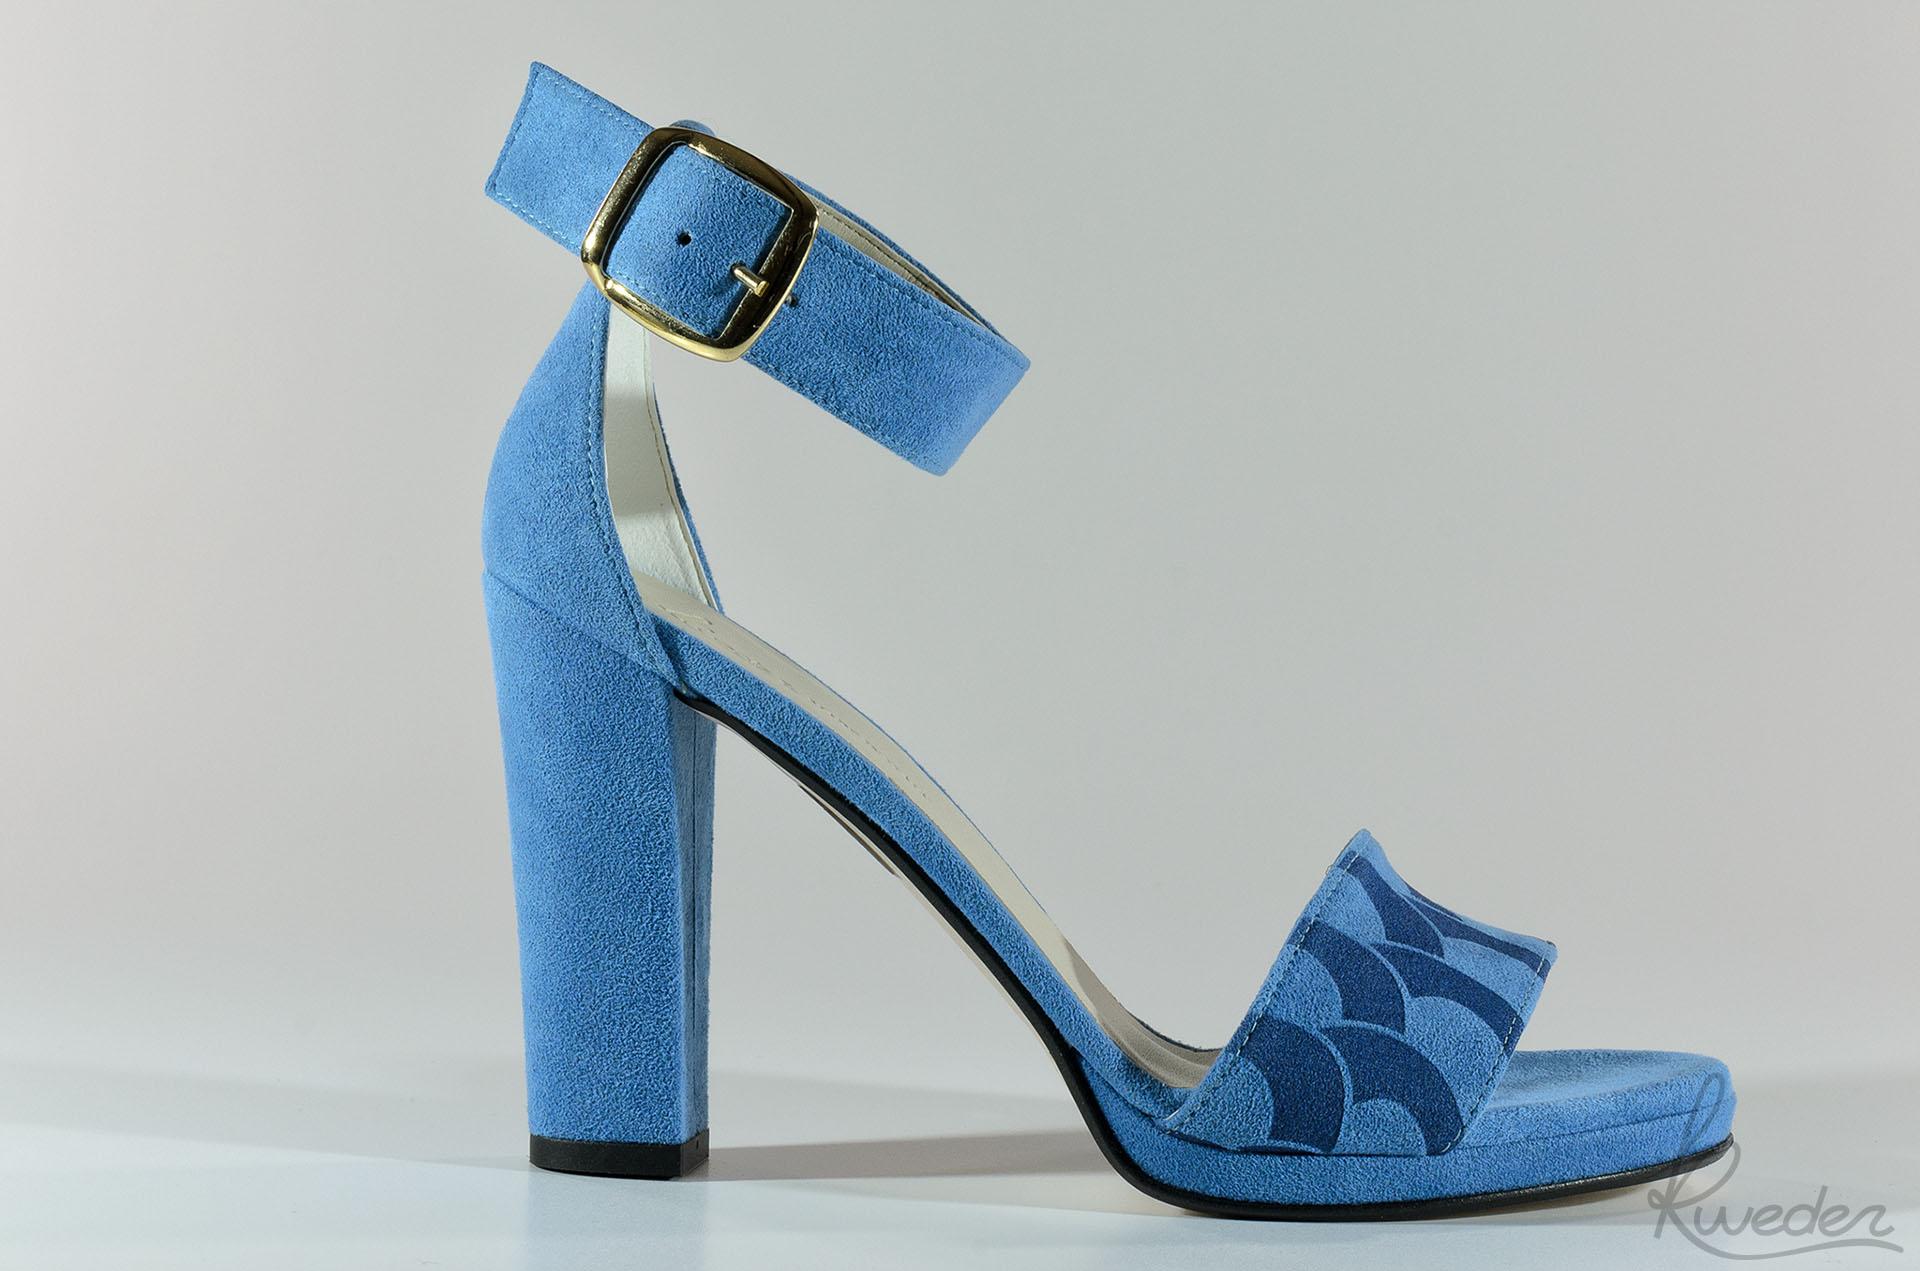 kweder scarpe sostenibili